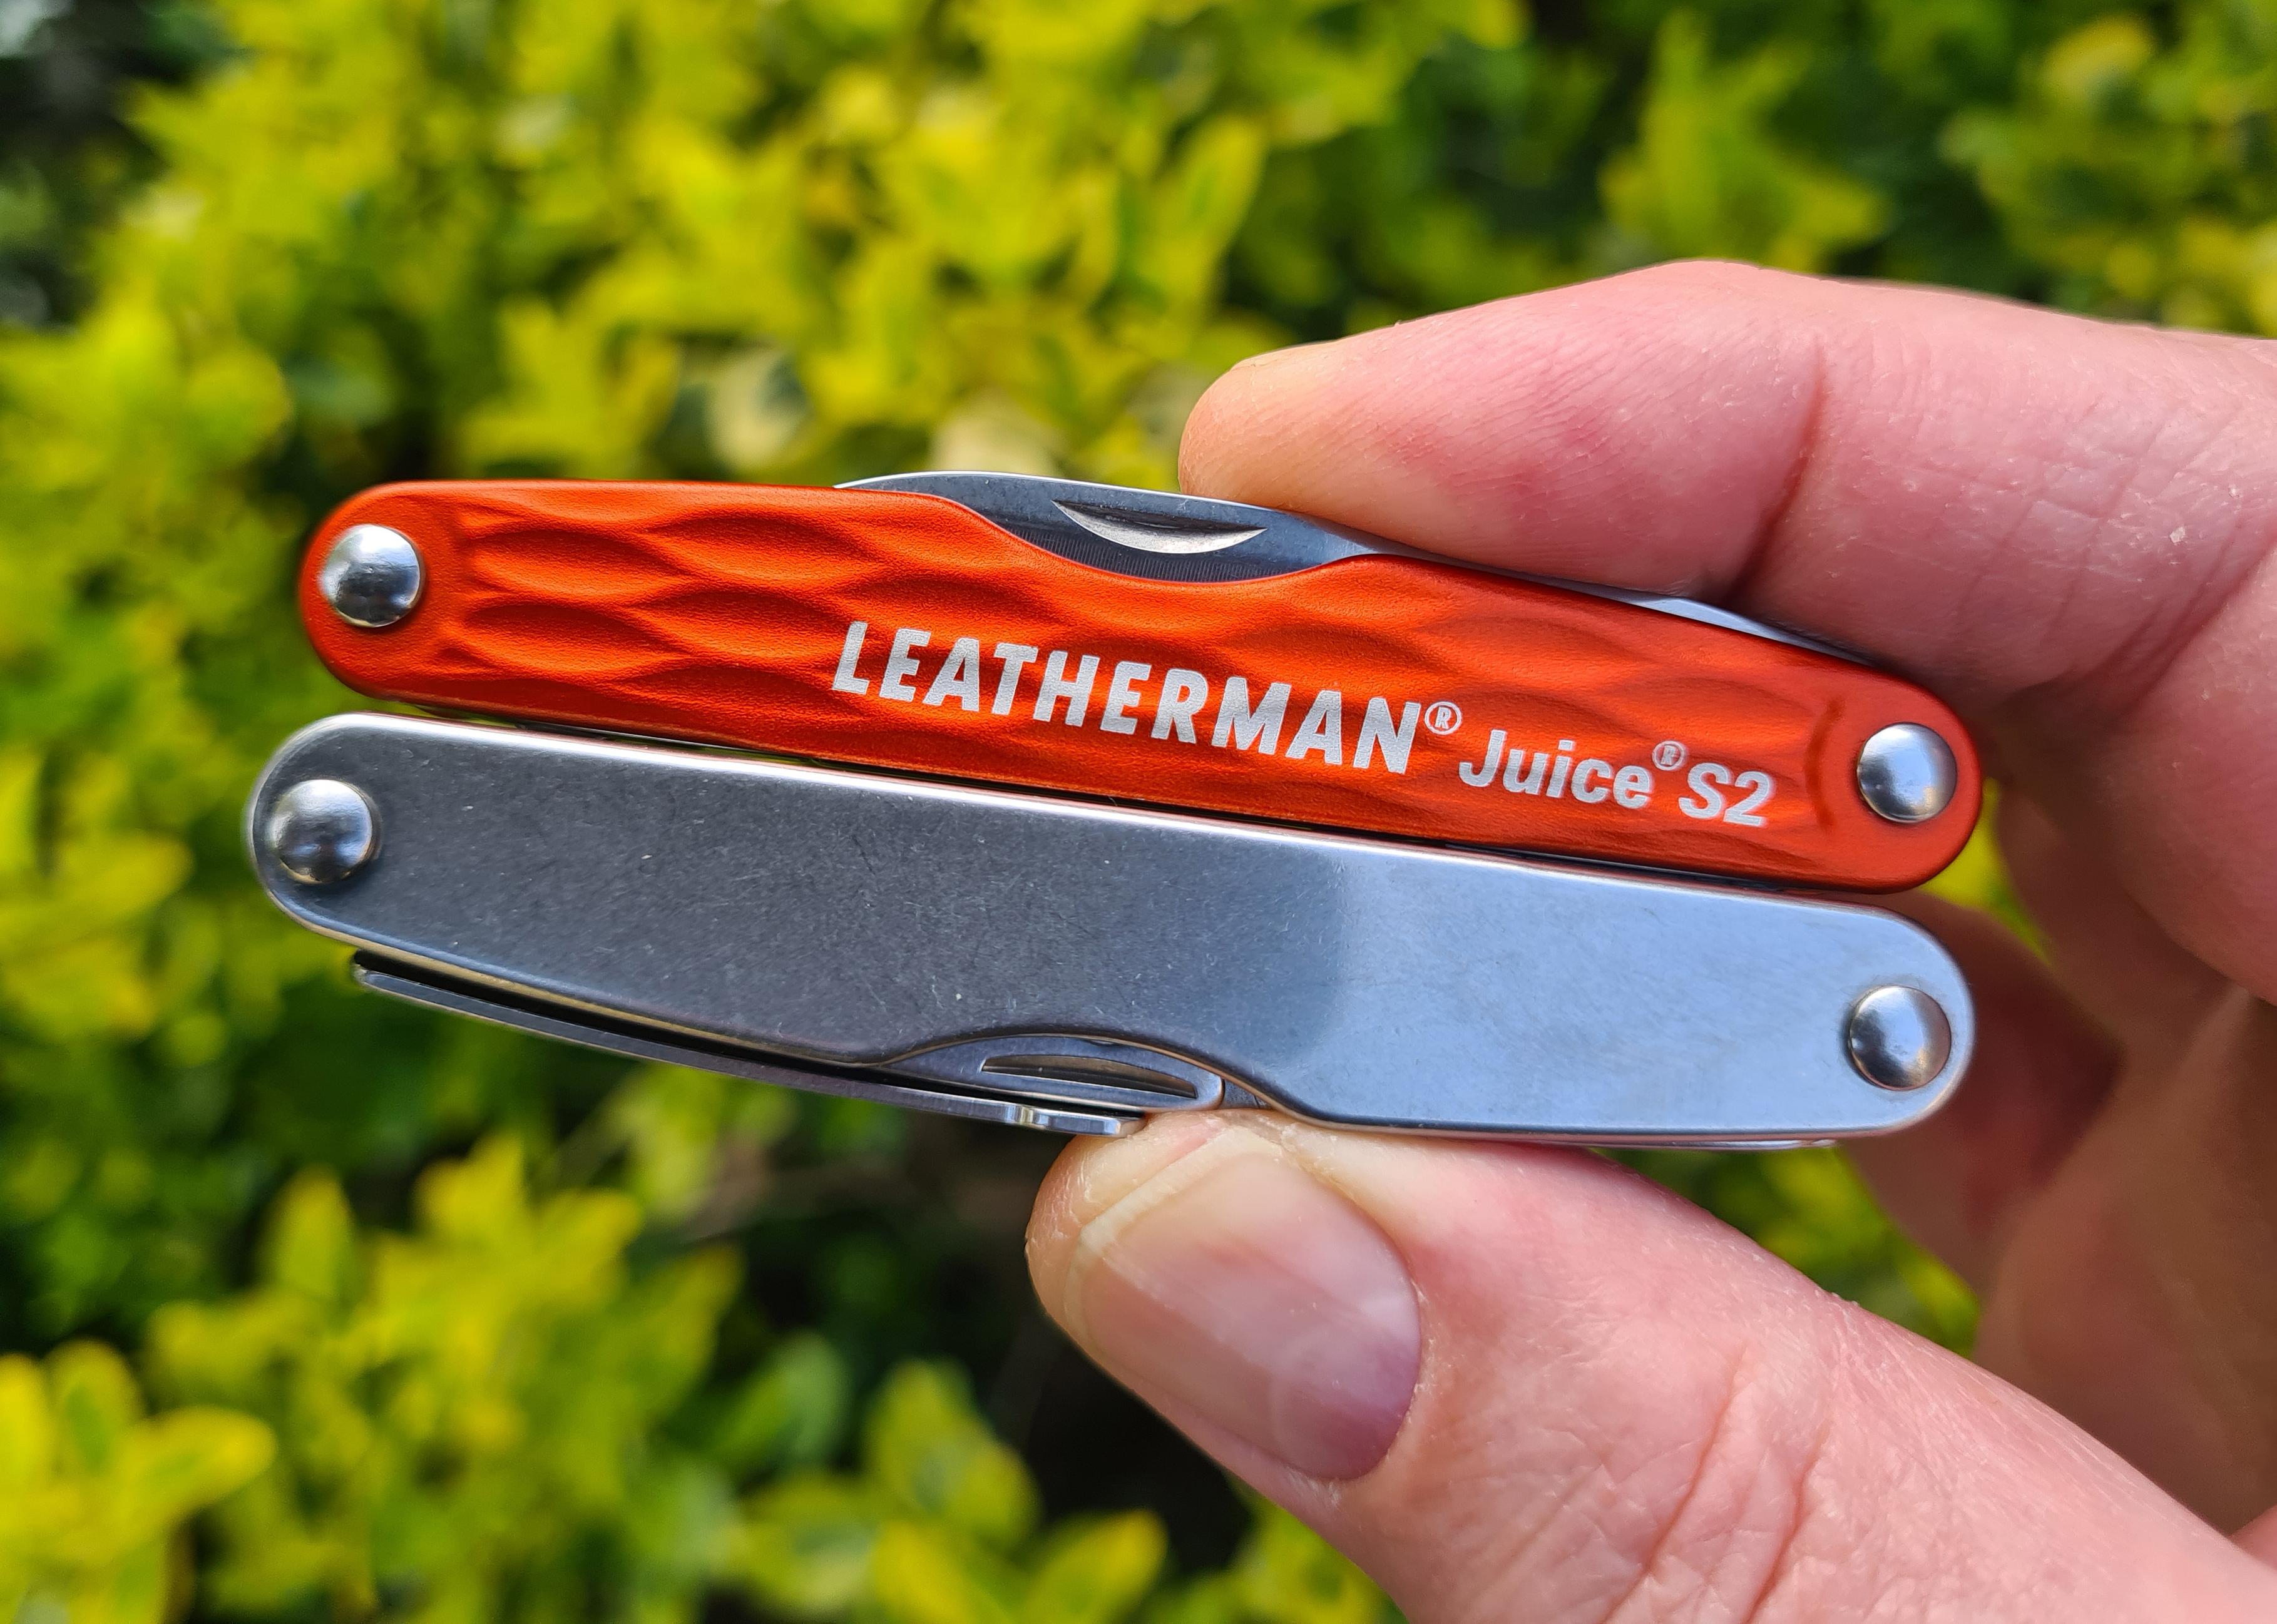 Leatherman Juice S2